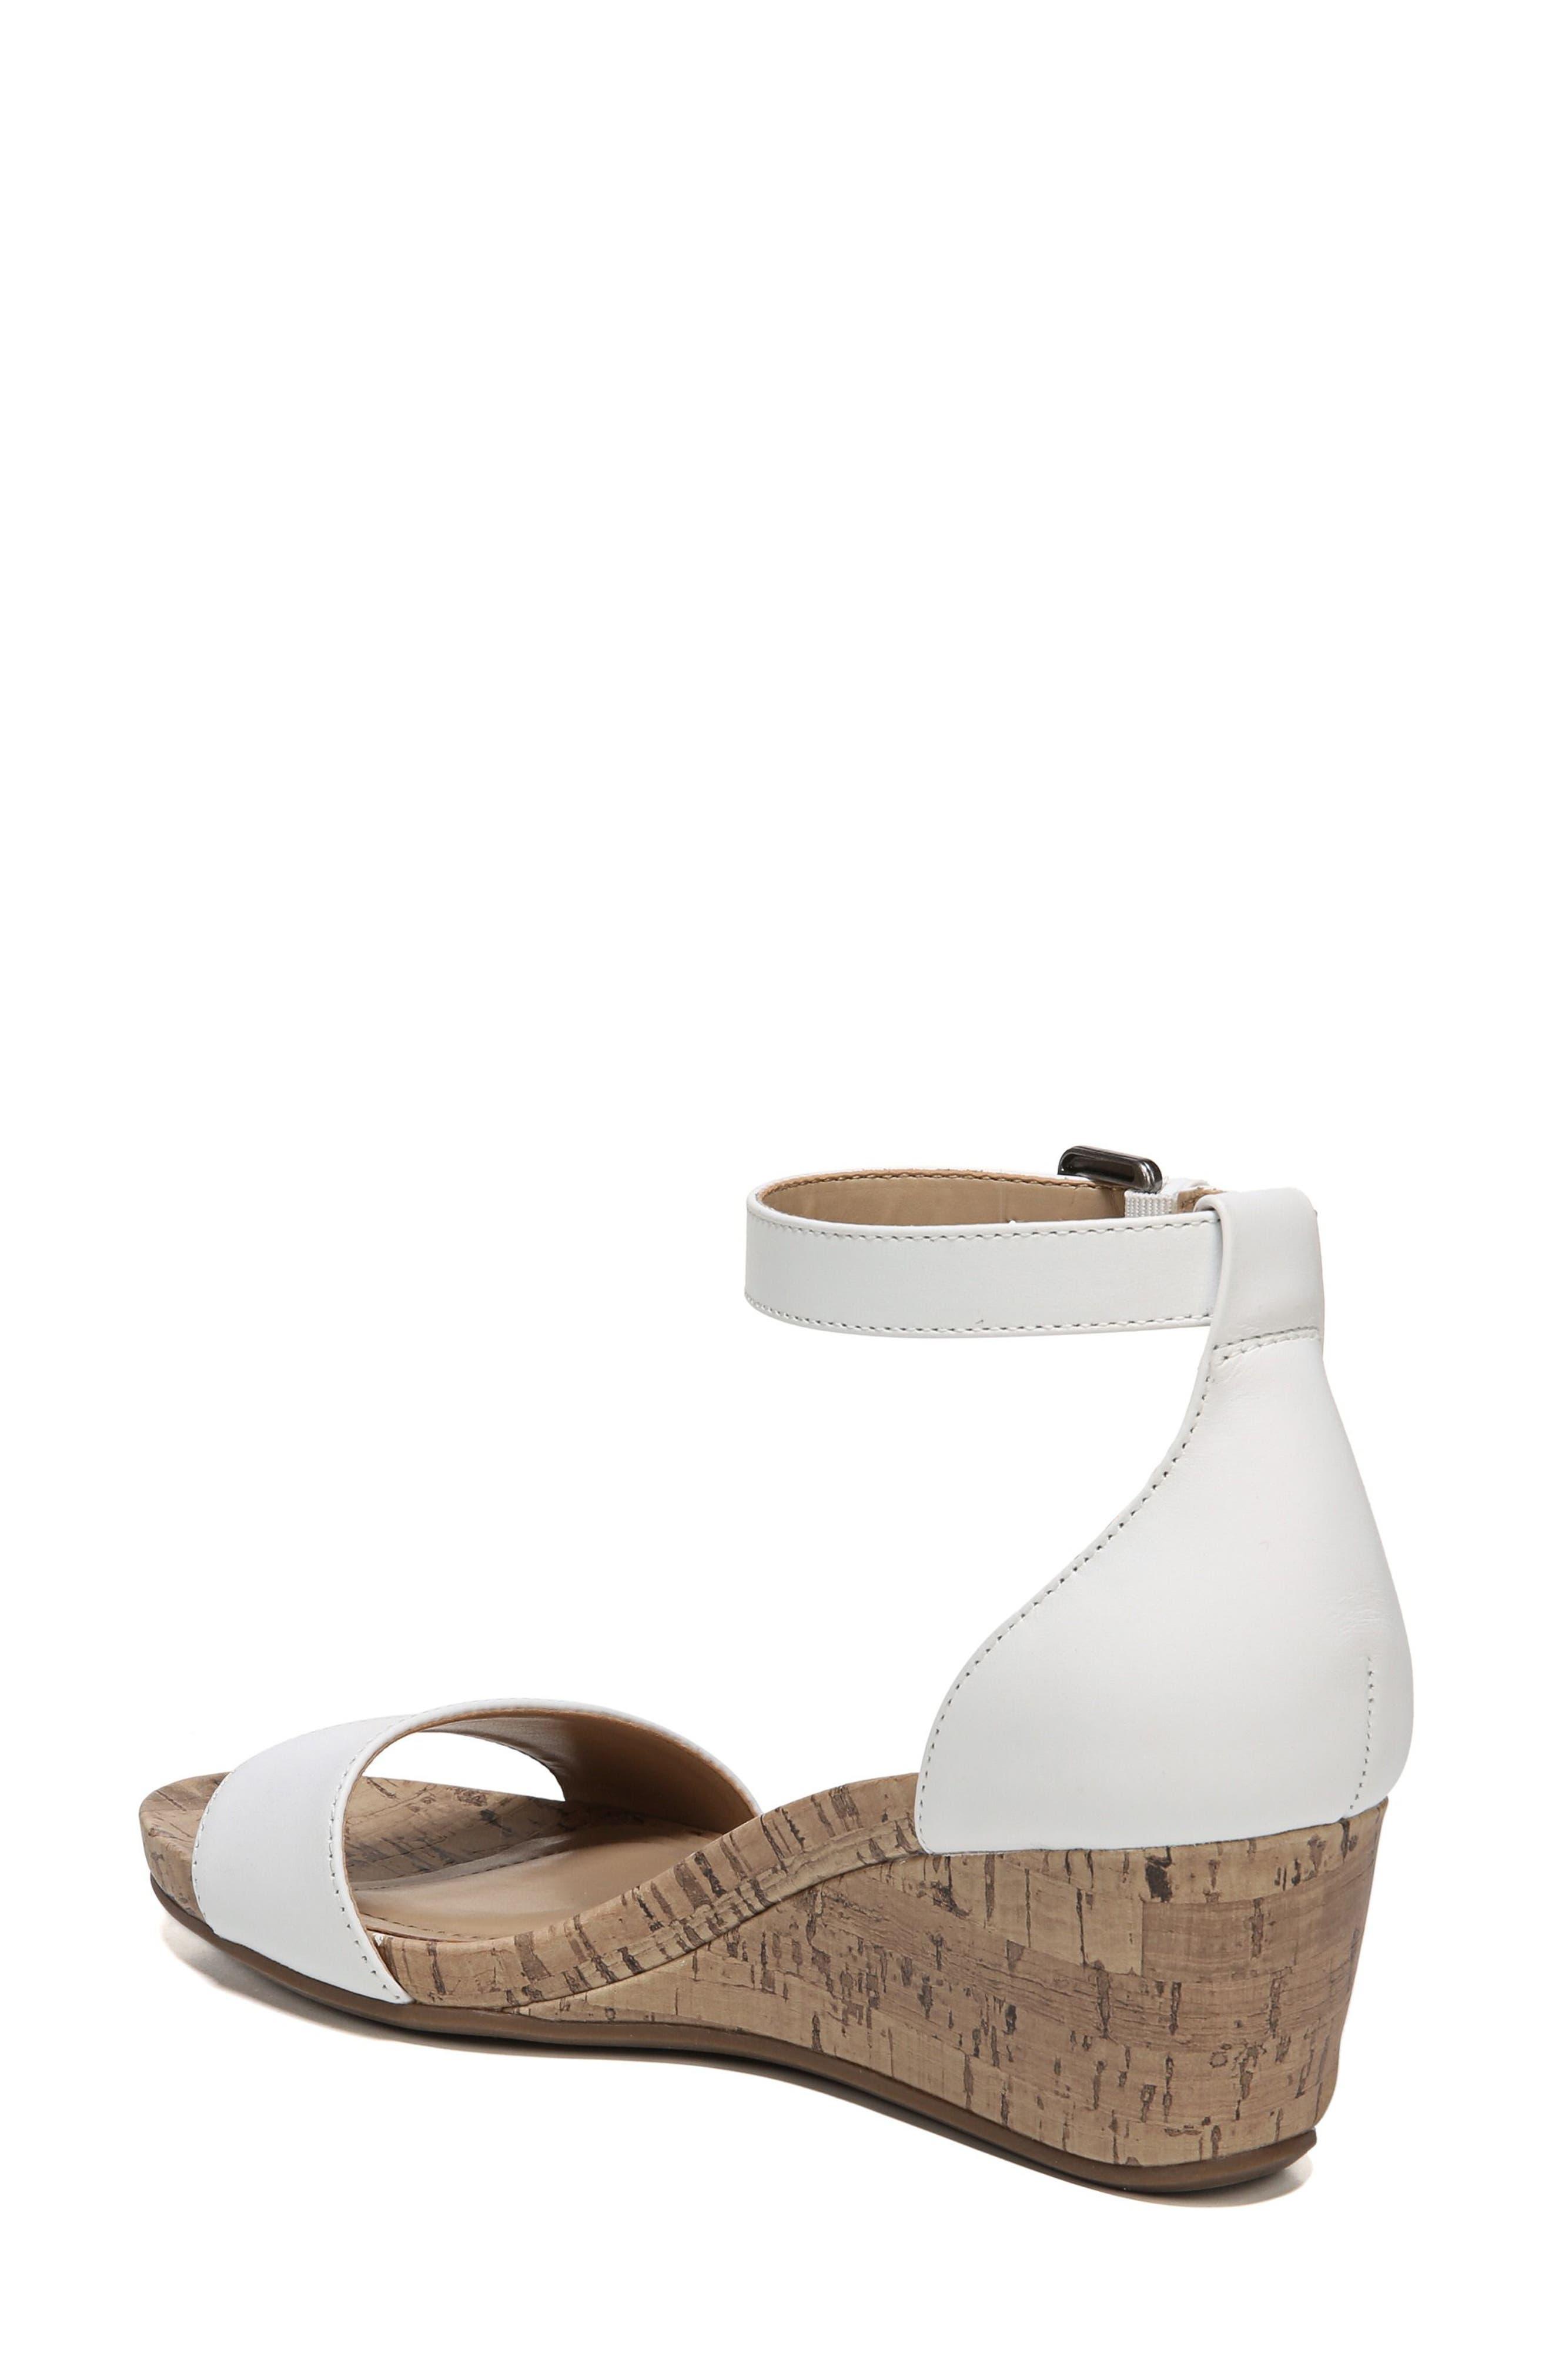 Cami Wedge Sandal,                             Alternate thumbnail 3, color,                             WHITE LEATHER